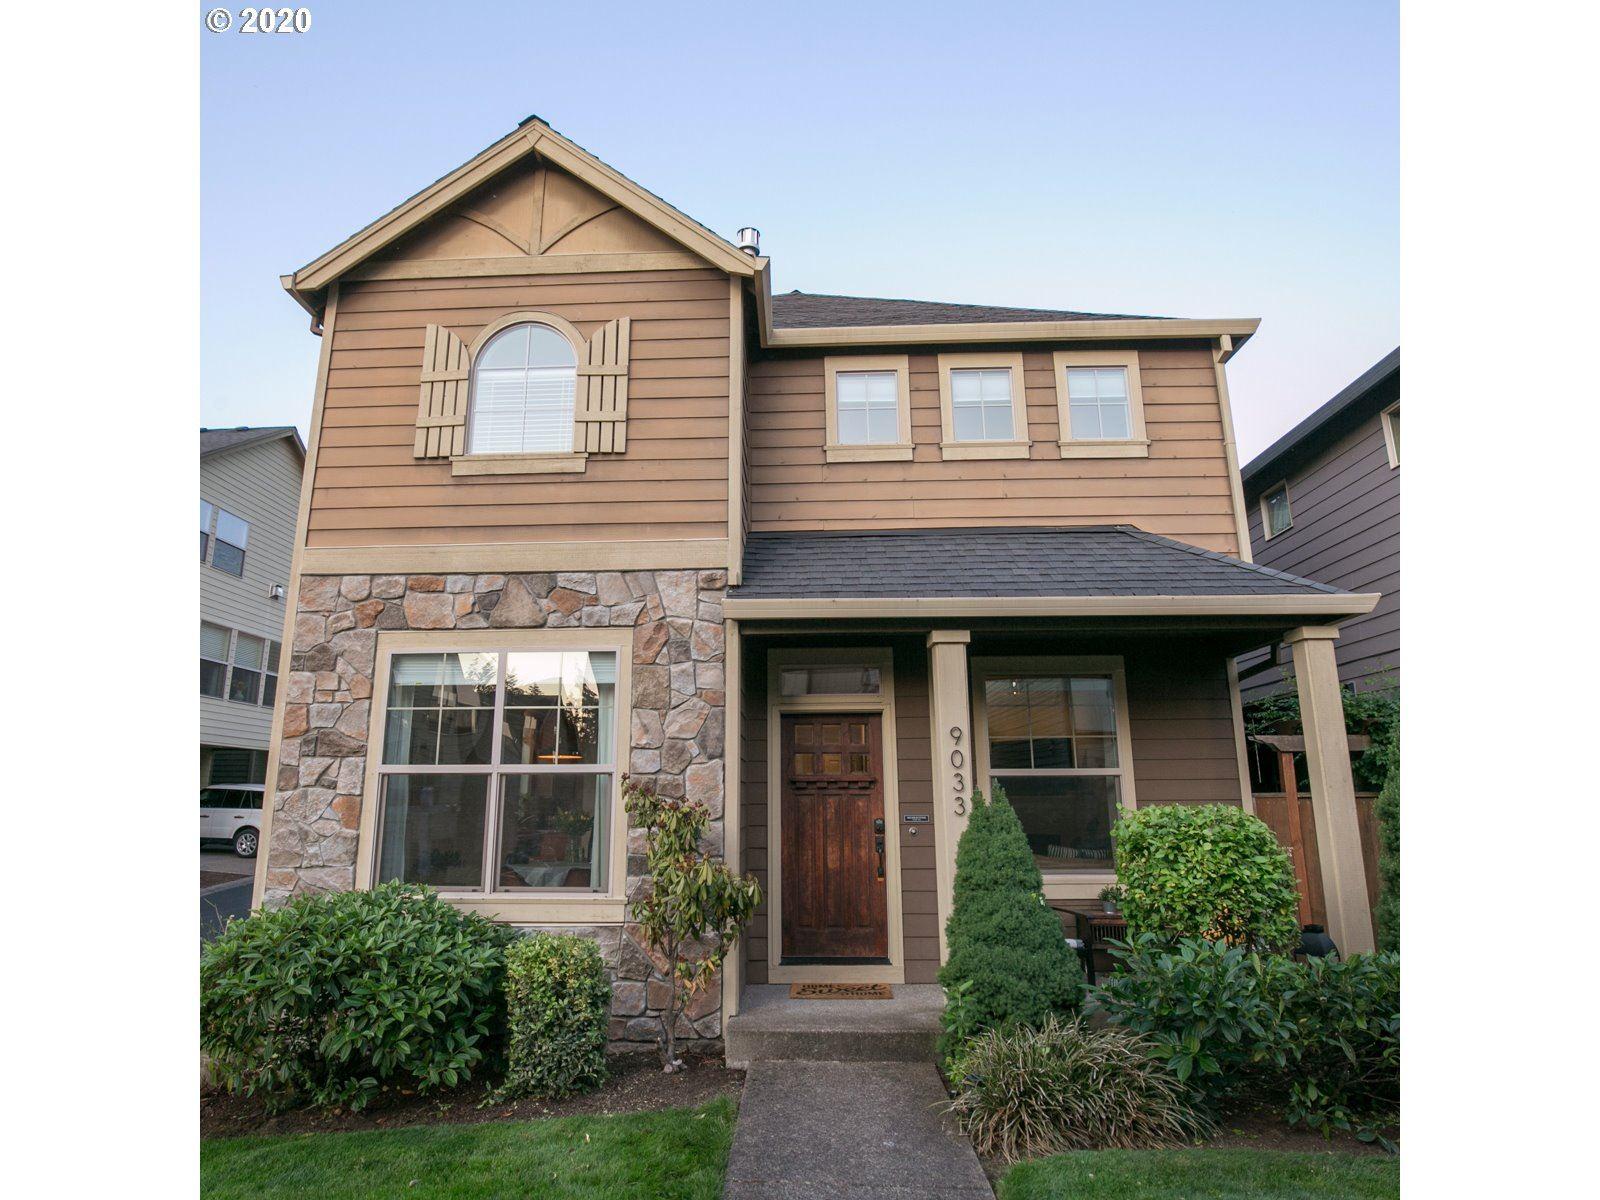 9033 SW SOPRANO LN, Portland, OR 97225 - MLS#: 20543863